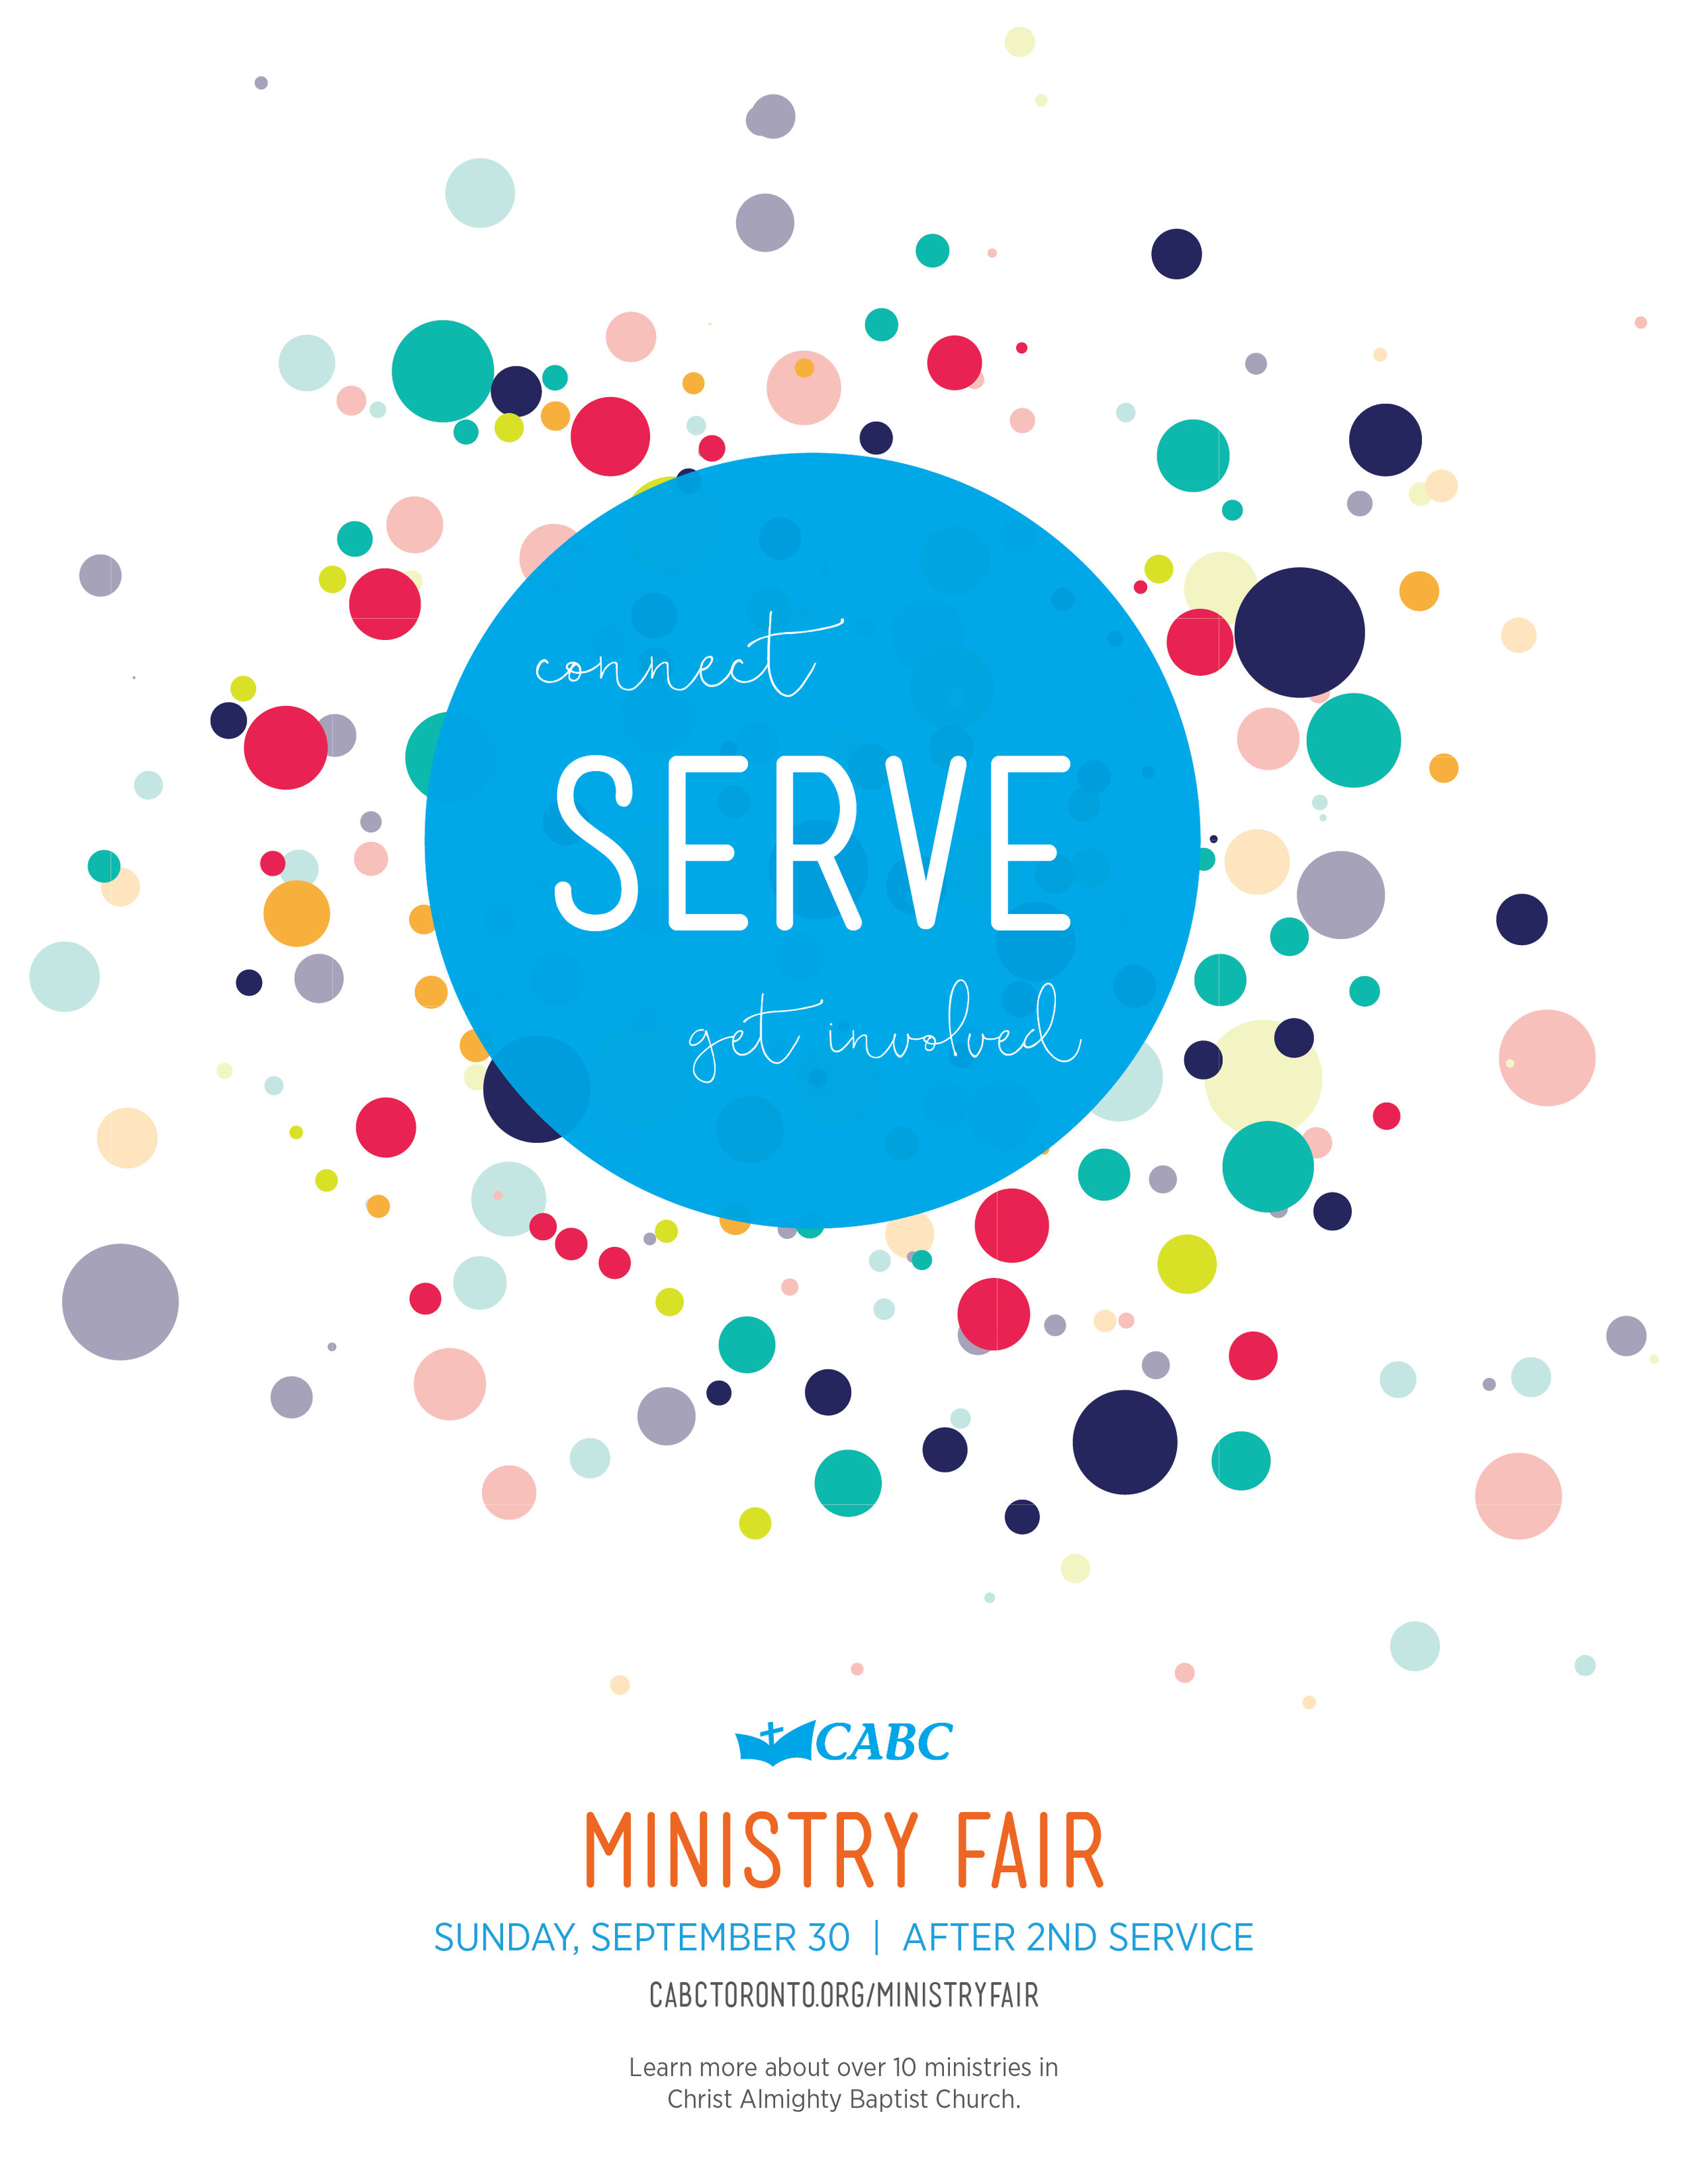 CABC-MinistryFair2018-Poster.jpg